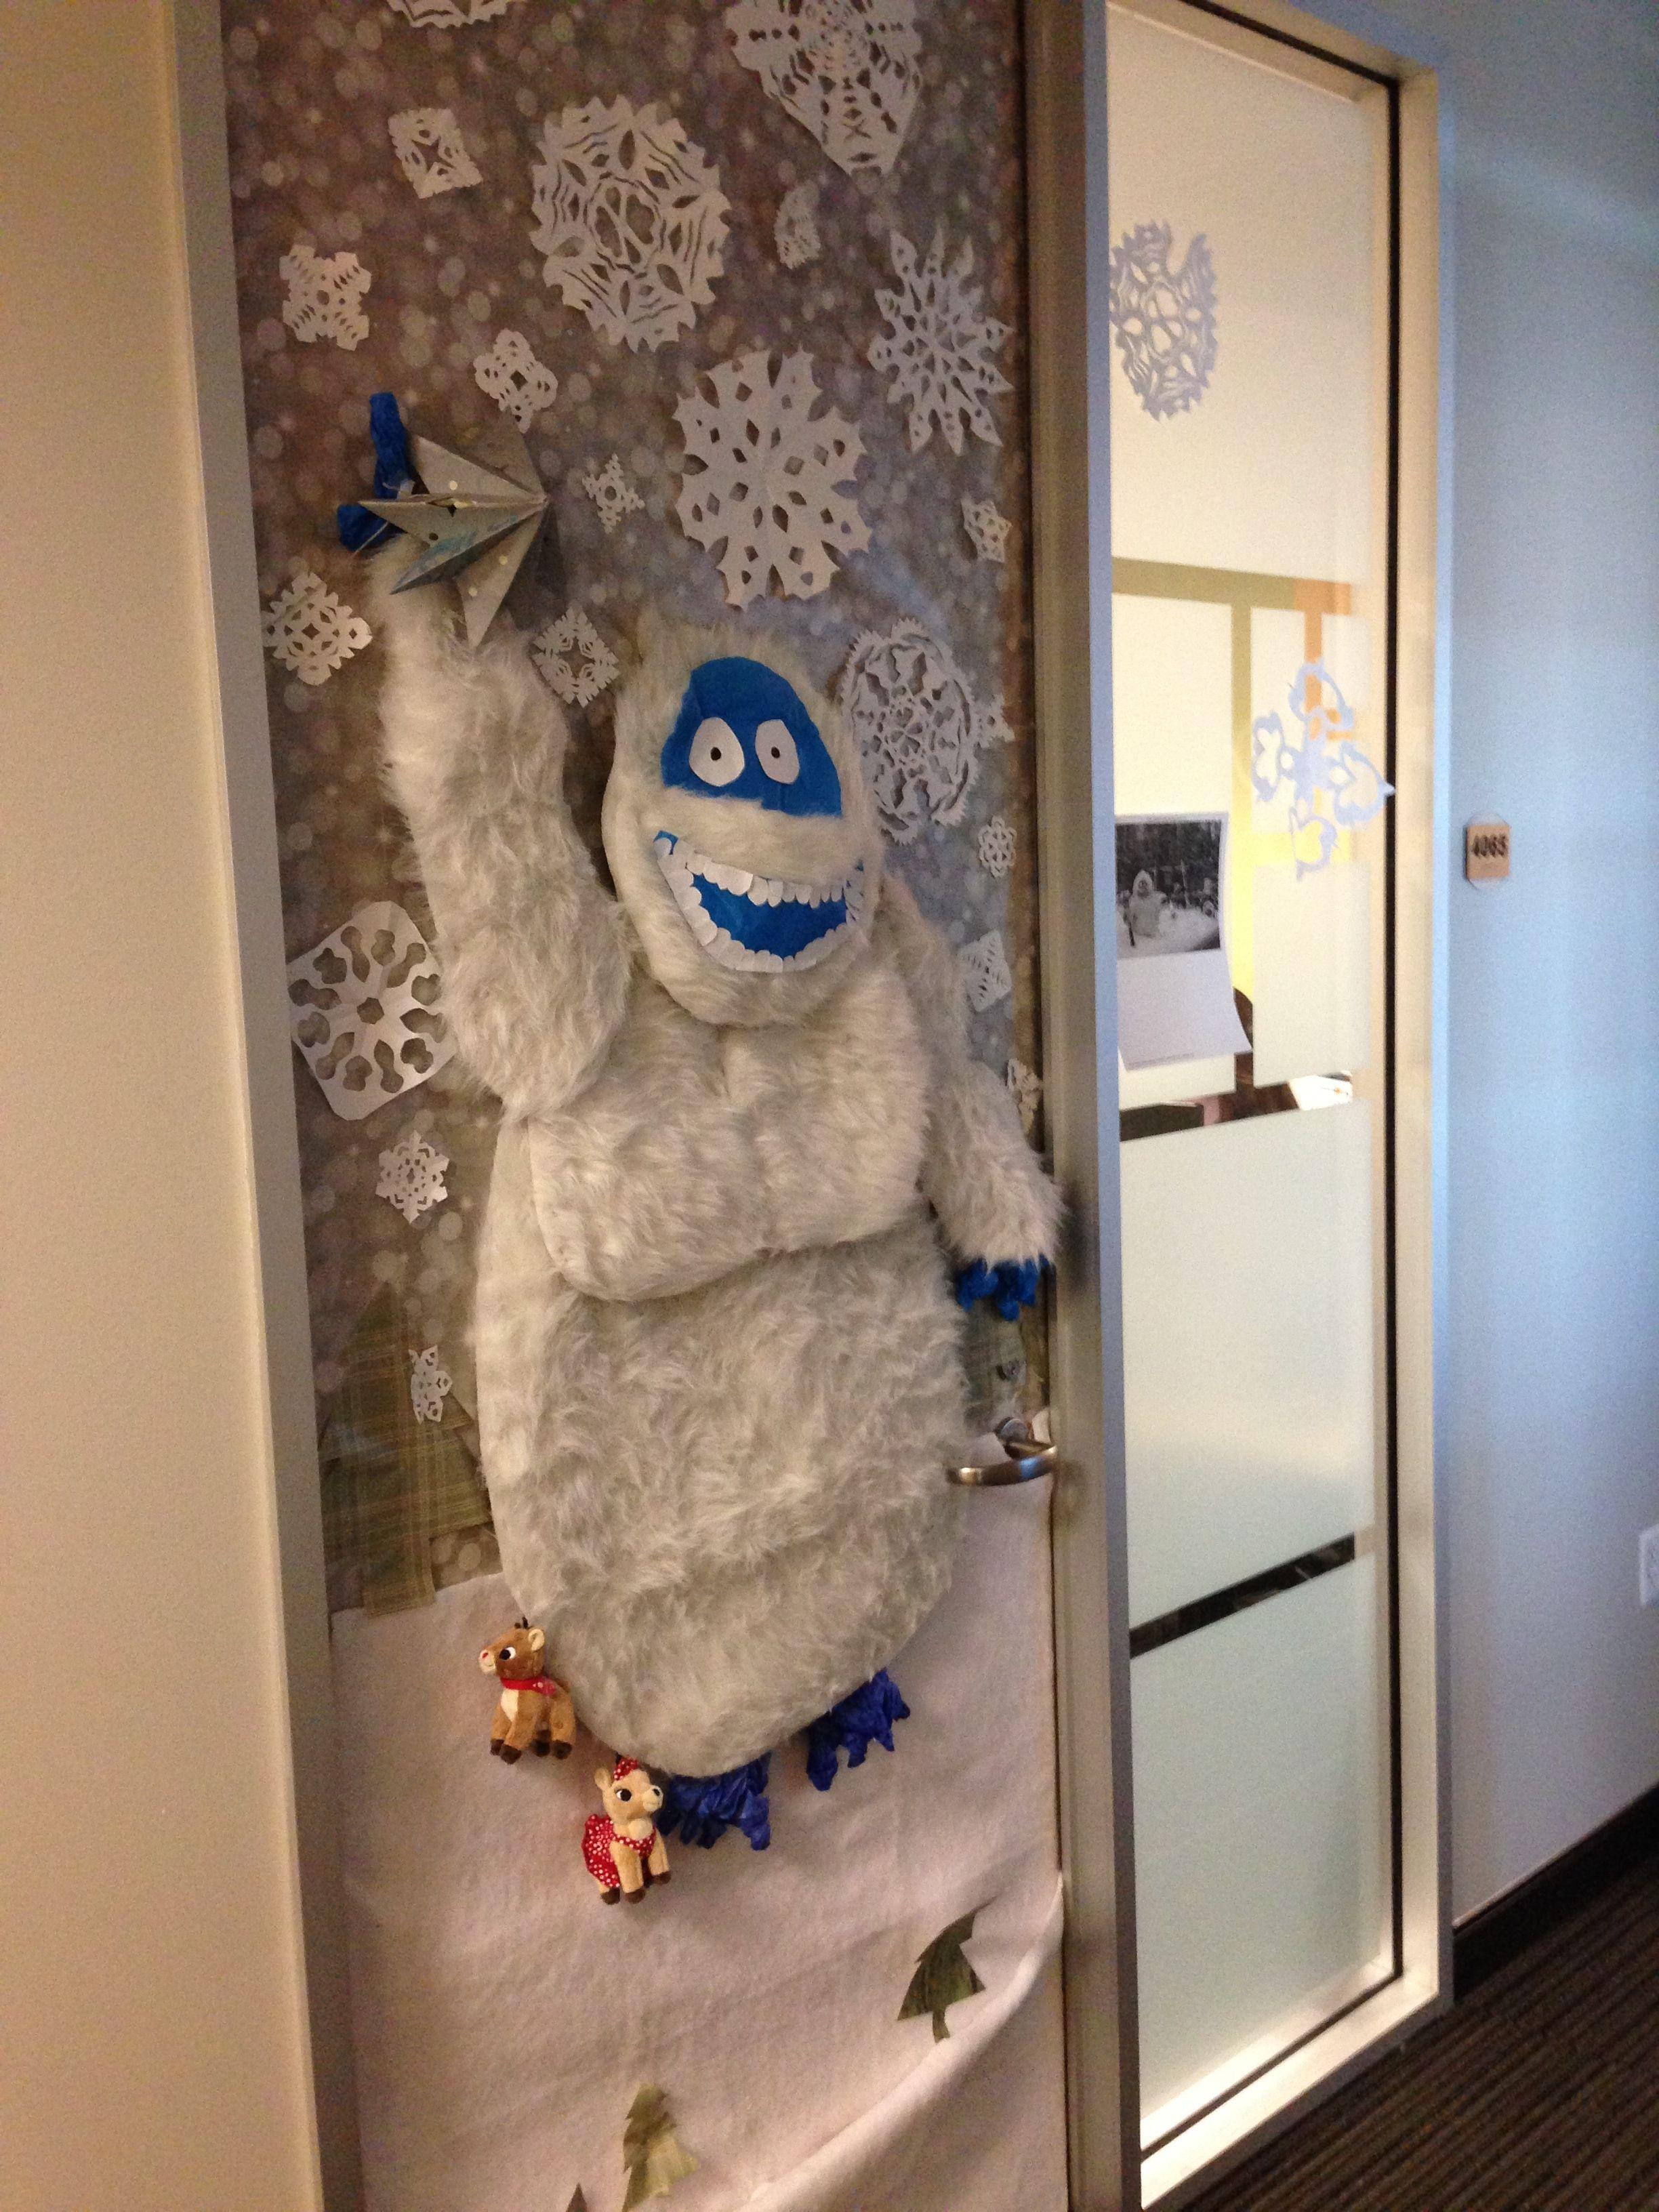 Abominable Snowman Complete With Reindeer Under His Feet Holidaydecoratio Door Decorating Contest Holiday Door Decorations Christmas Door Decorating Contest